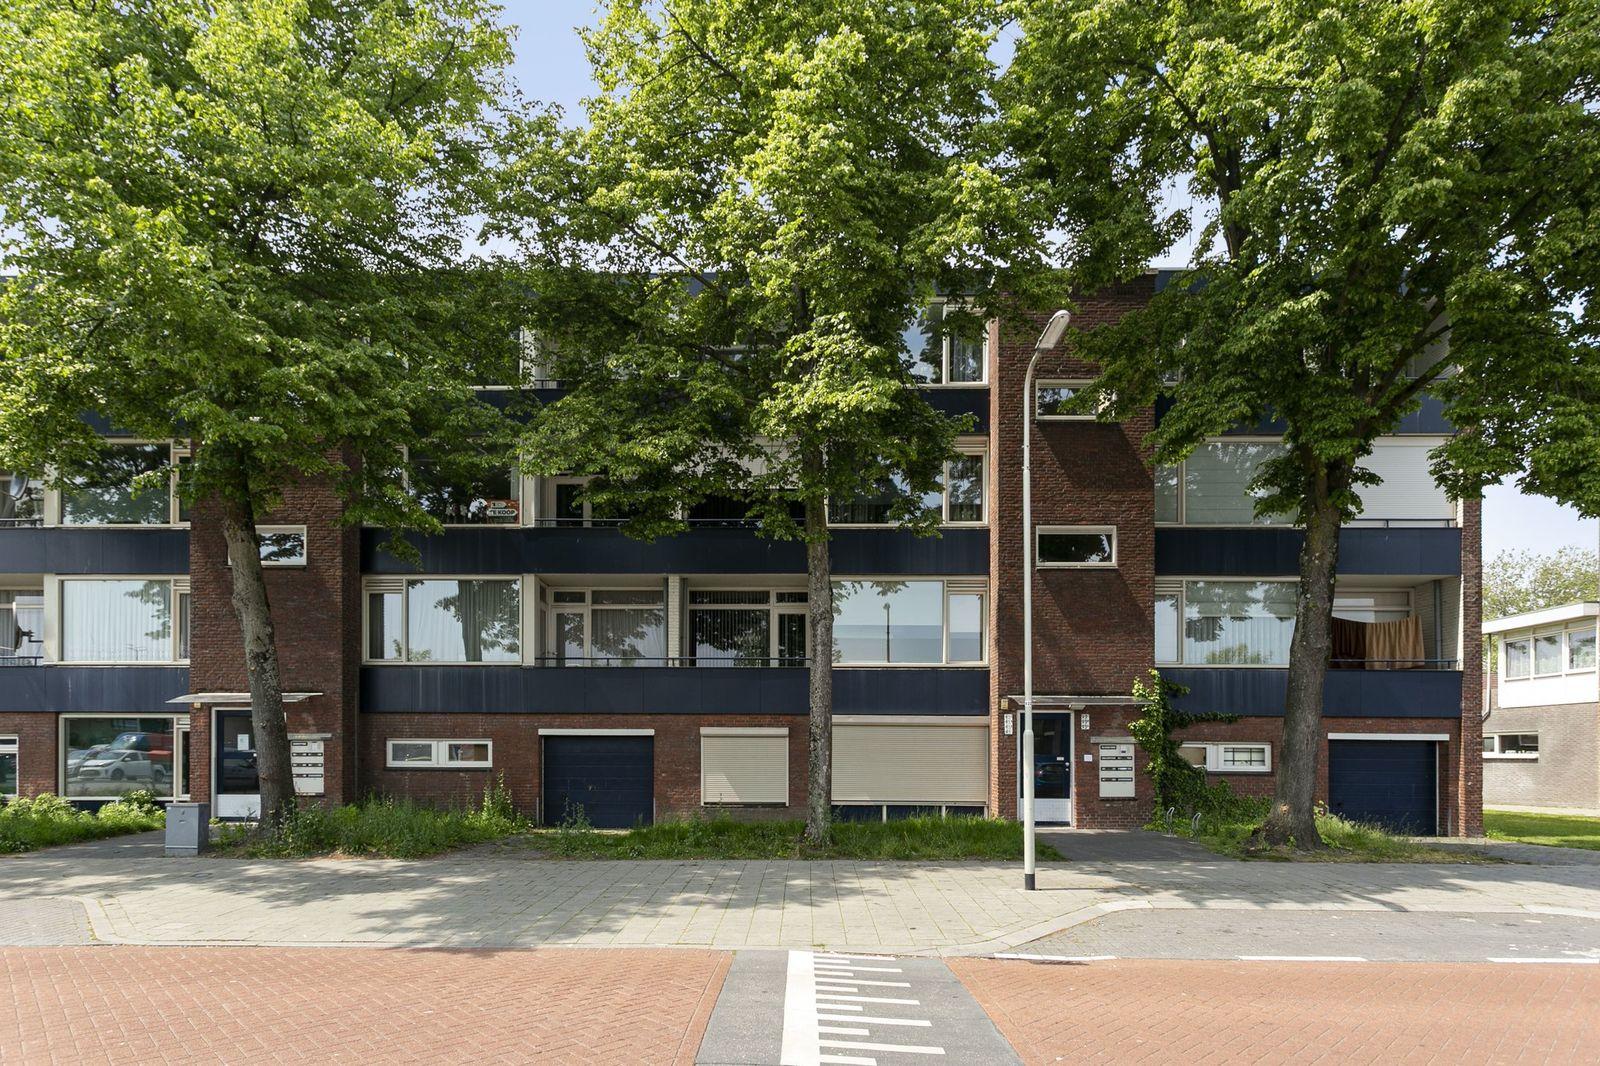 Philipslaan 91-c, Roosendaal